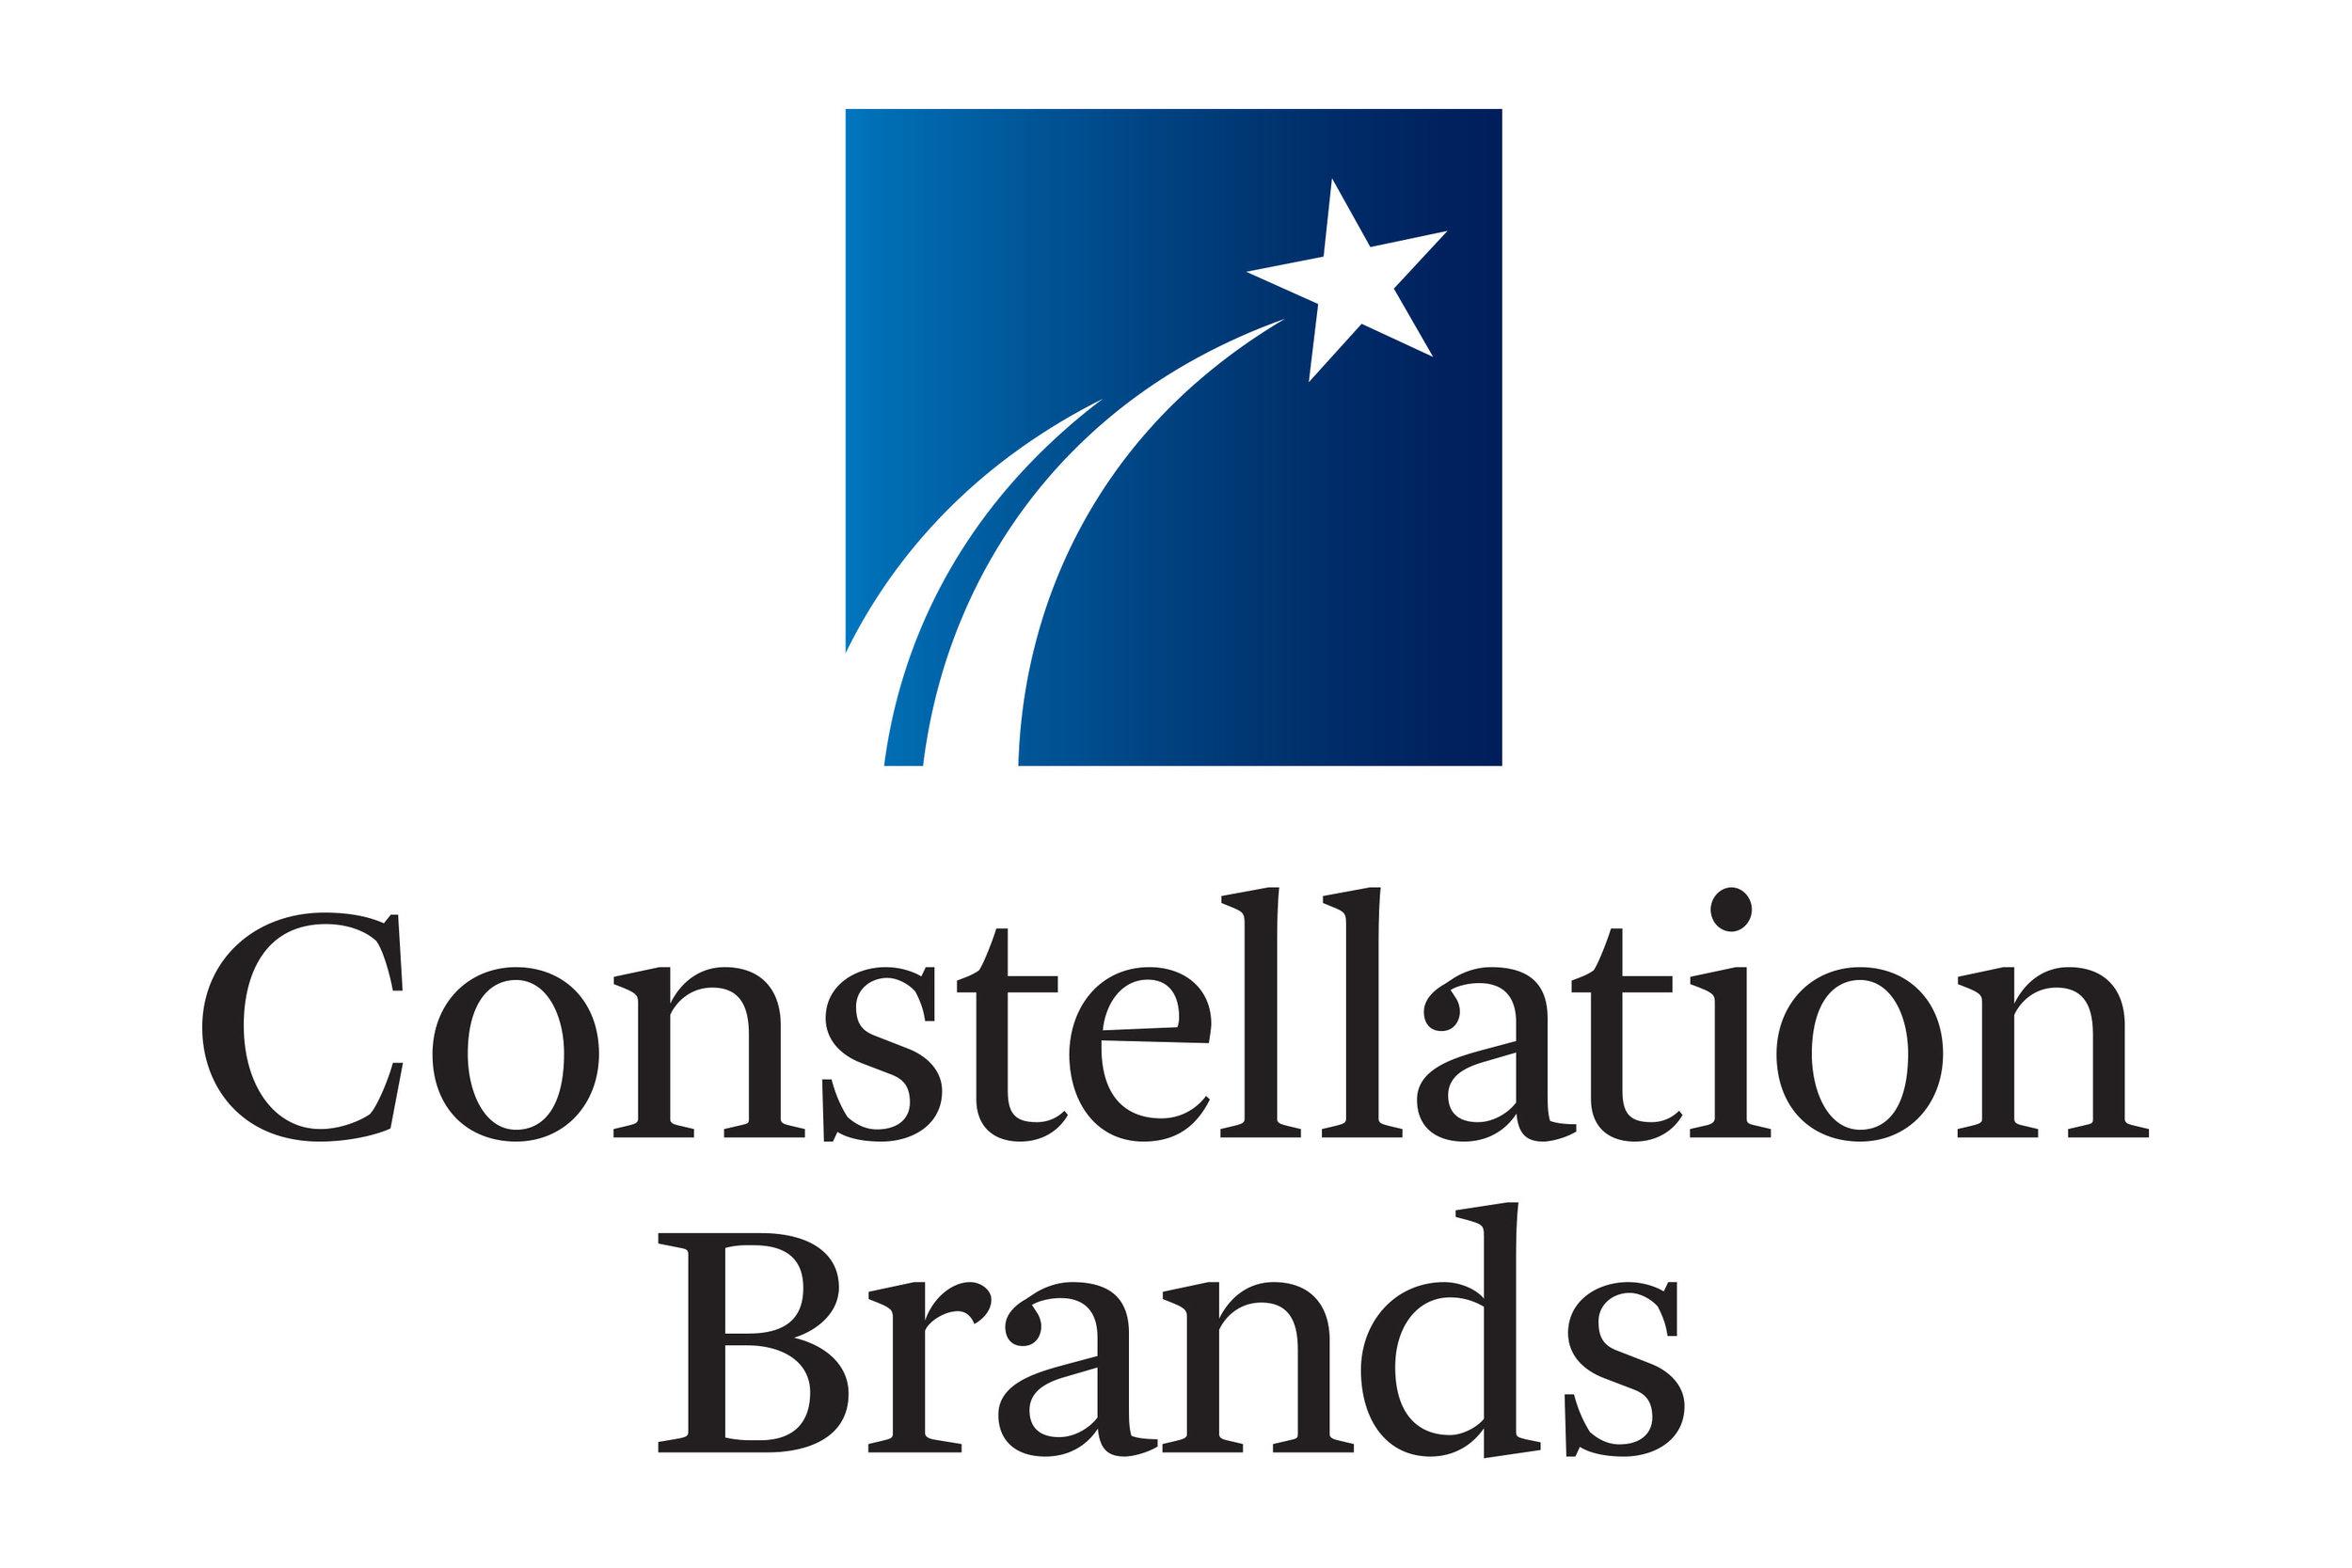 Constellation Brands Full Color Vertical JPG Logo.jpg